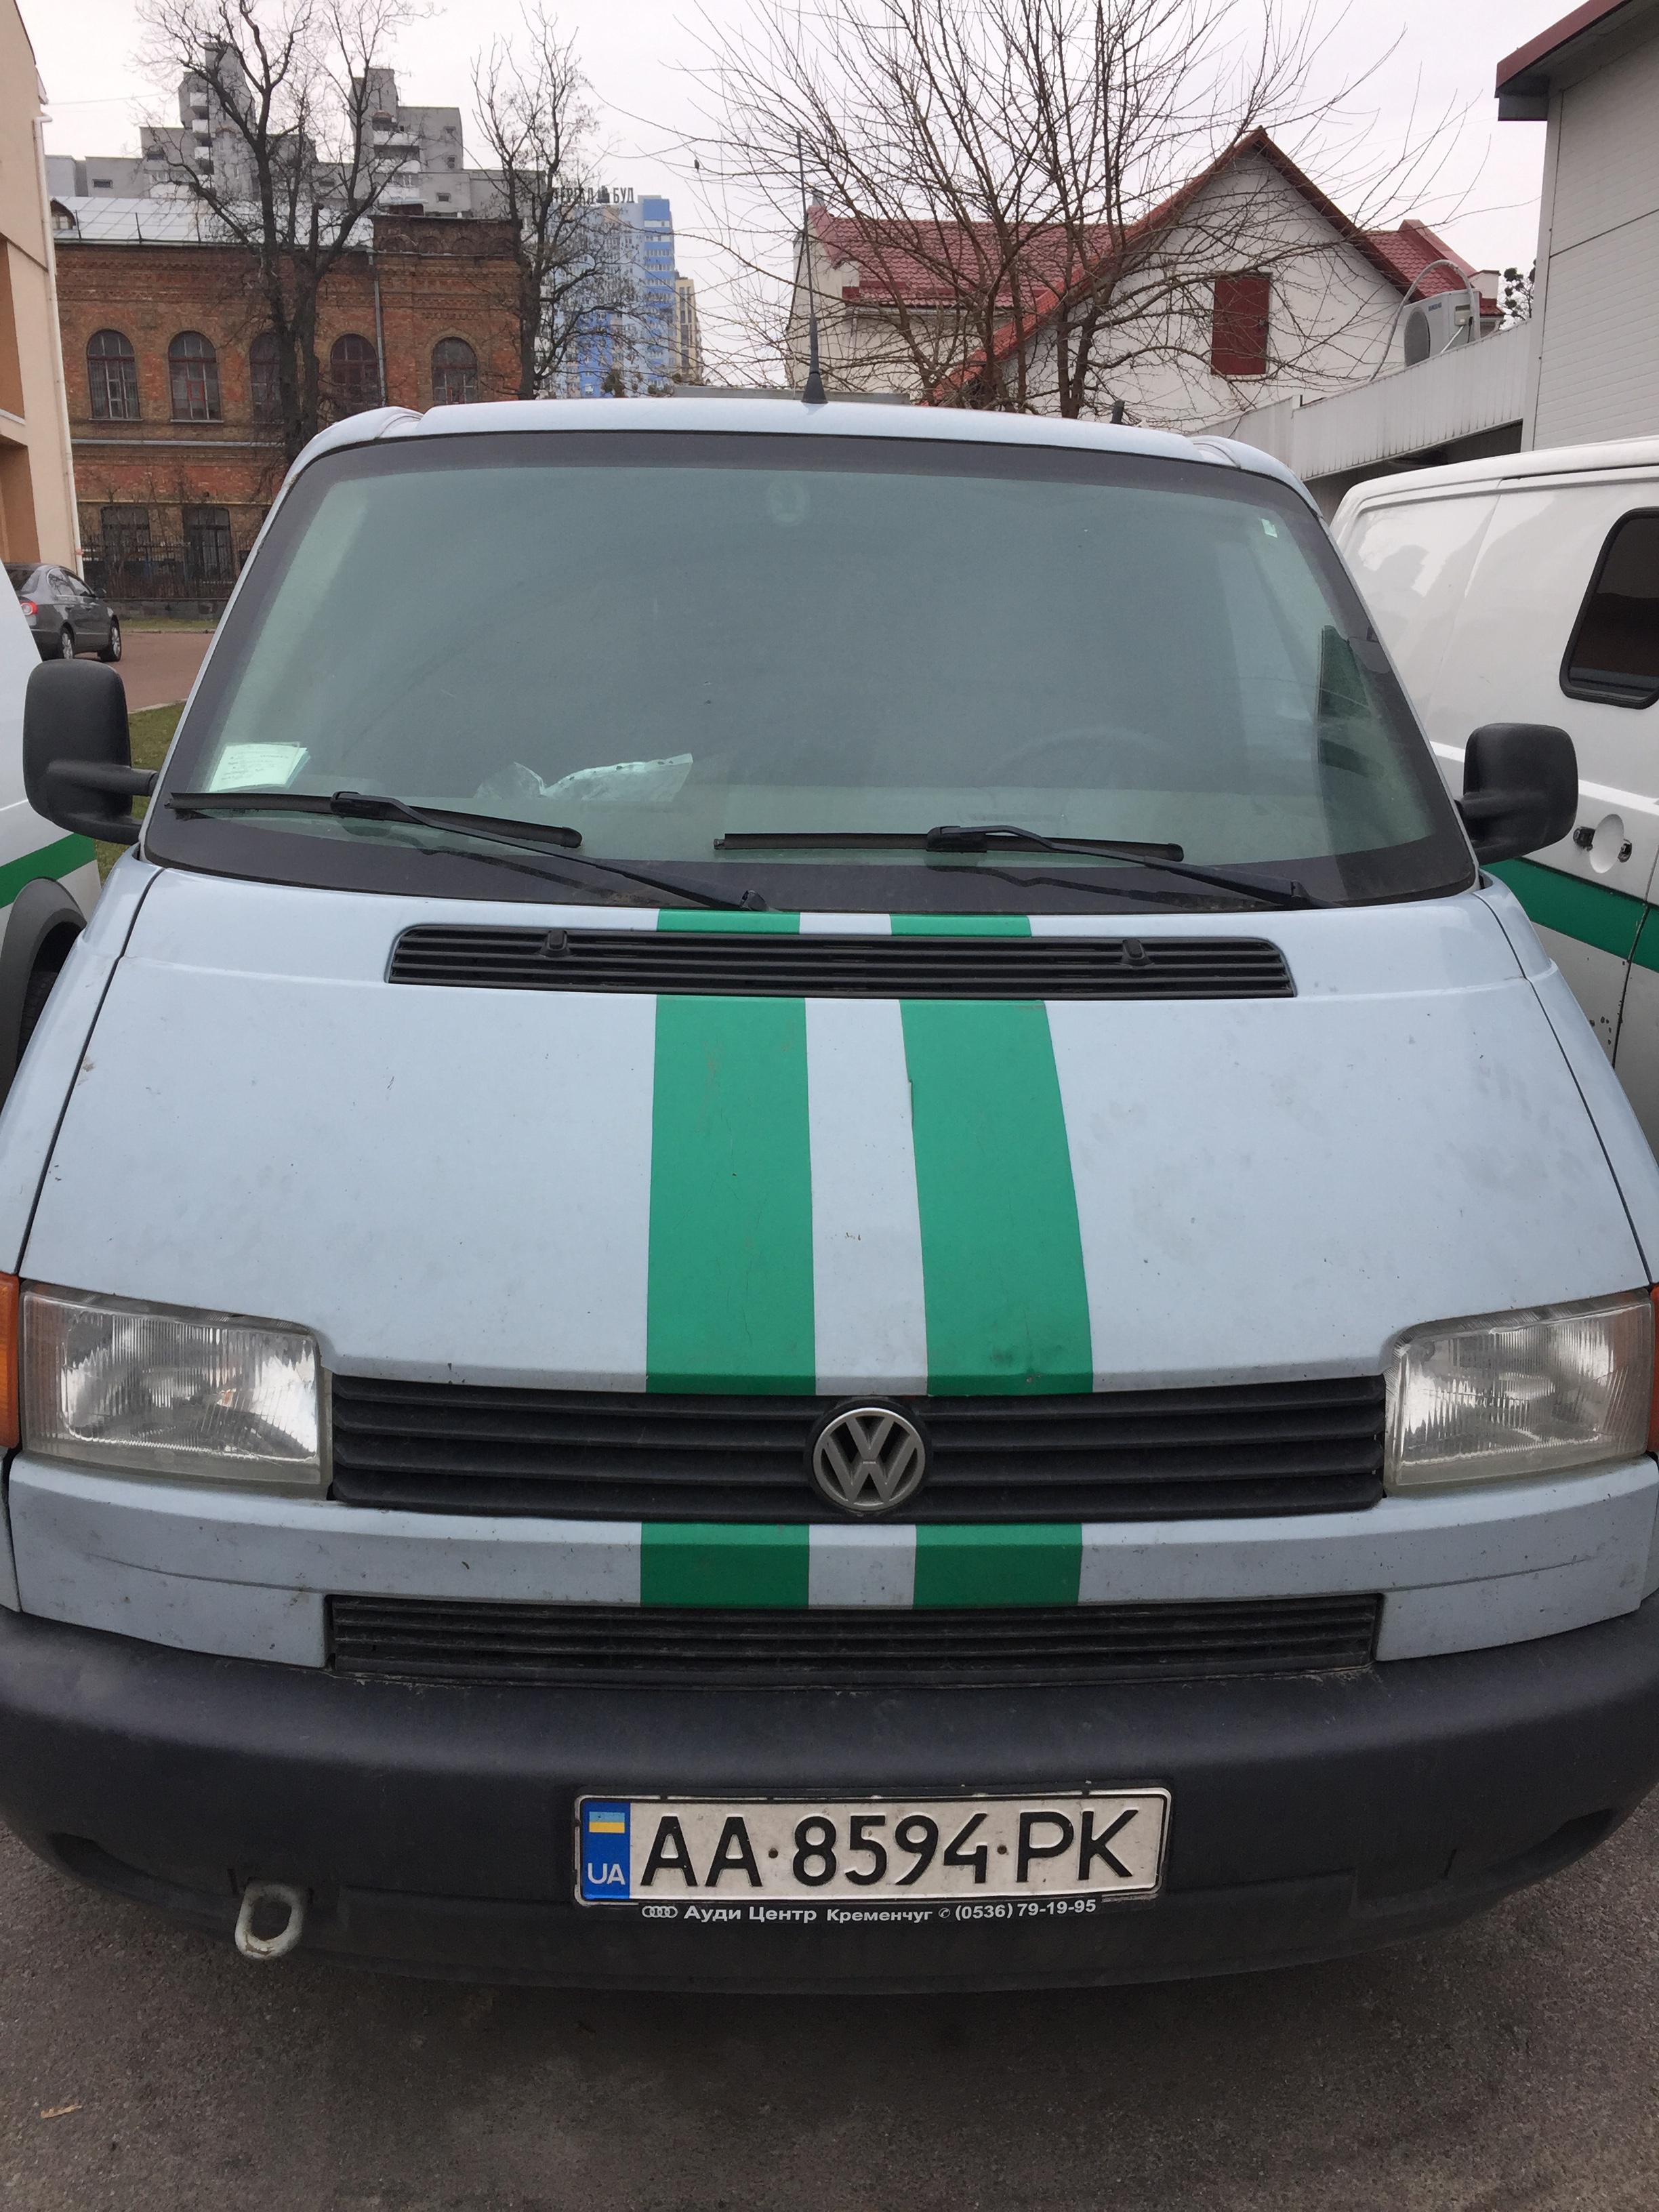 Фольксваген Транспорт АА8594РК